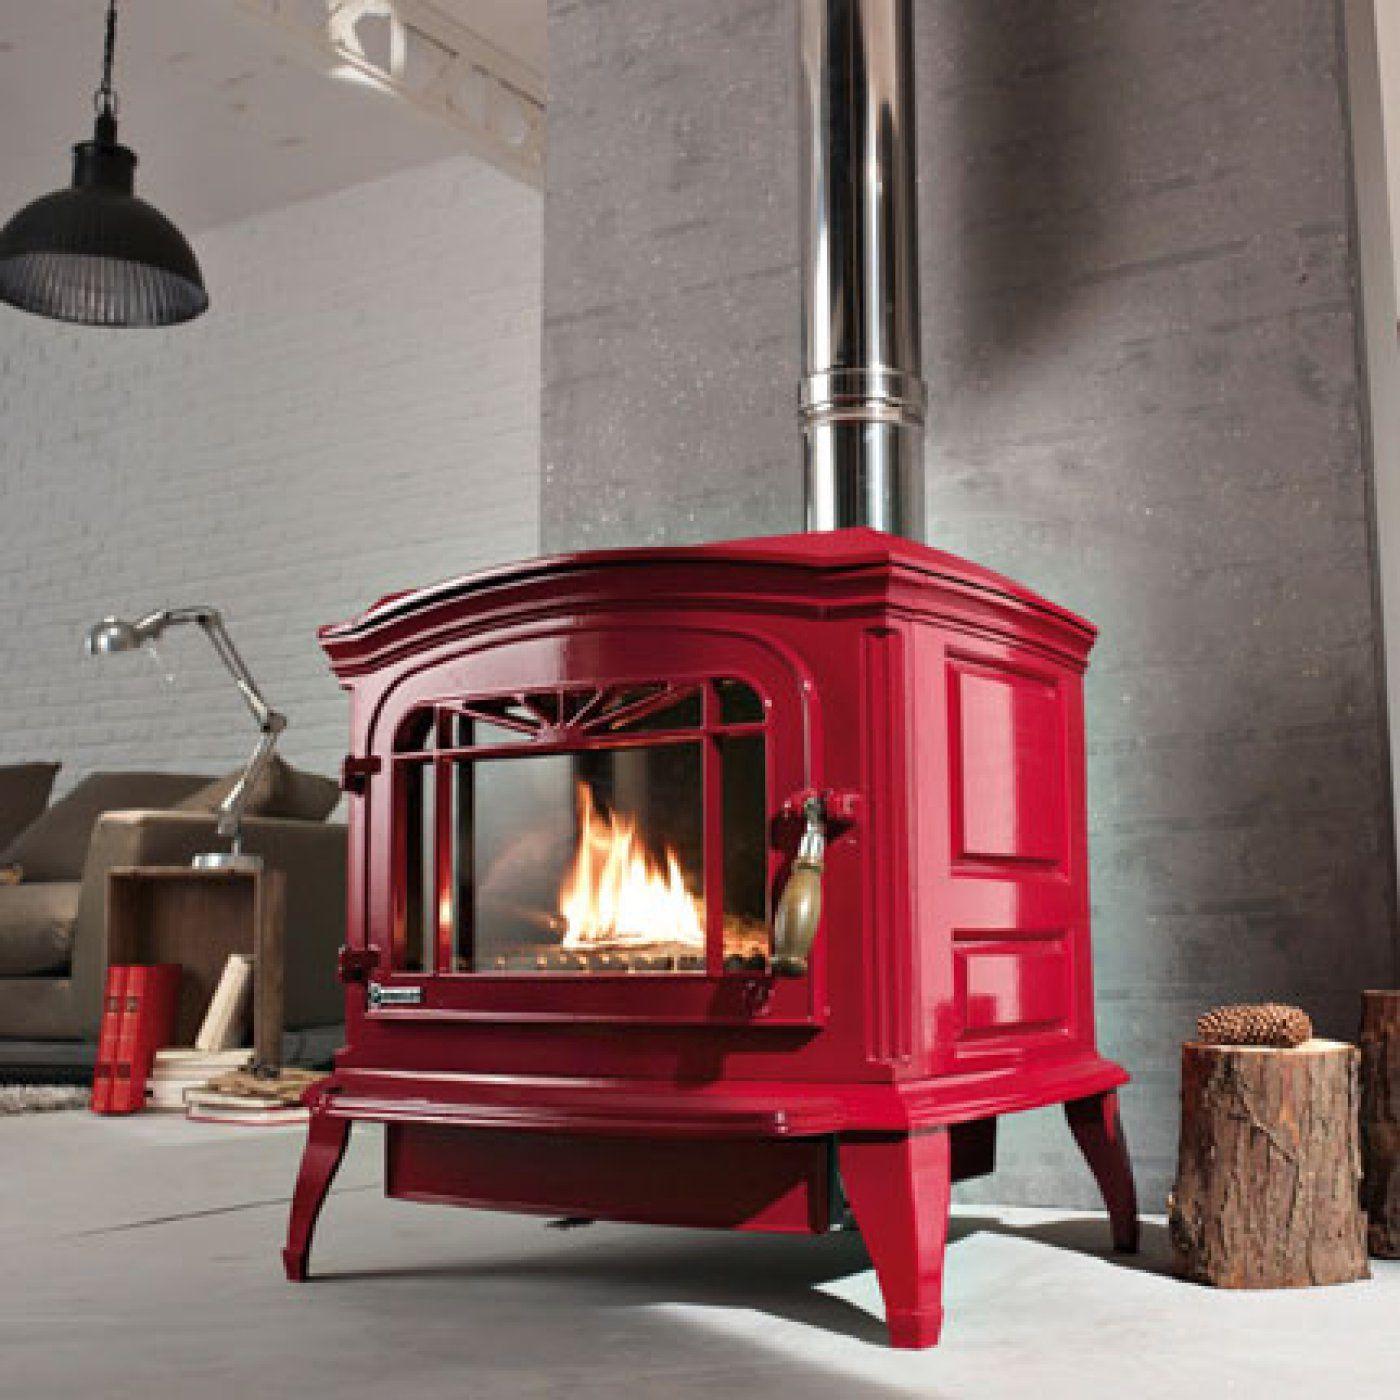 Hearthstone Fireplace Insert Awesome Poªle  Bois Bradford Invicta Kitchen